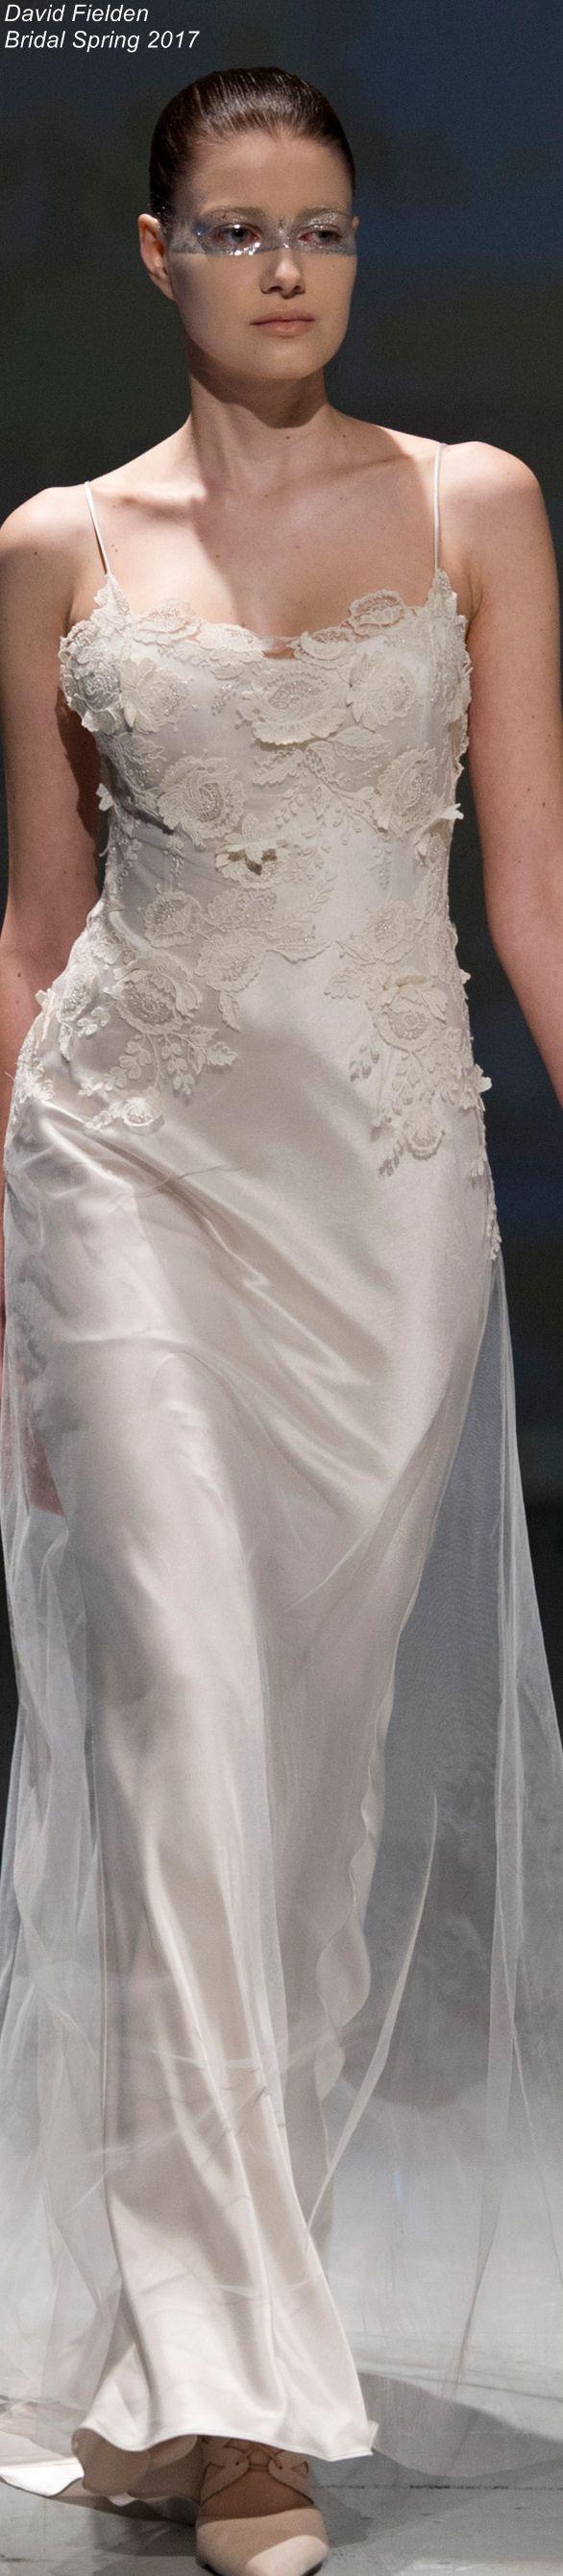 17 best David Fielden Wedding Dresses images on Pinterest   Short ...